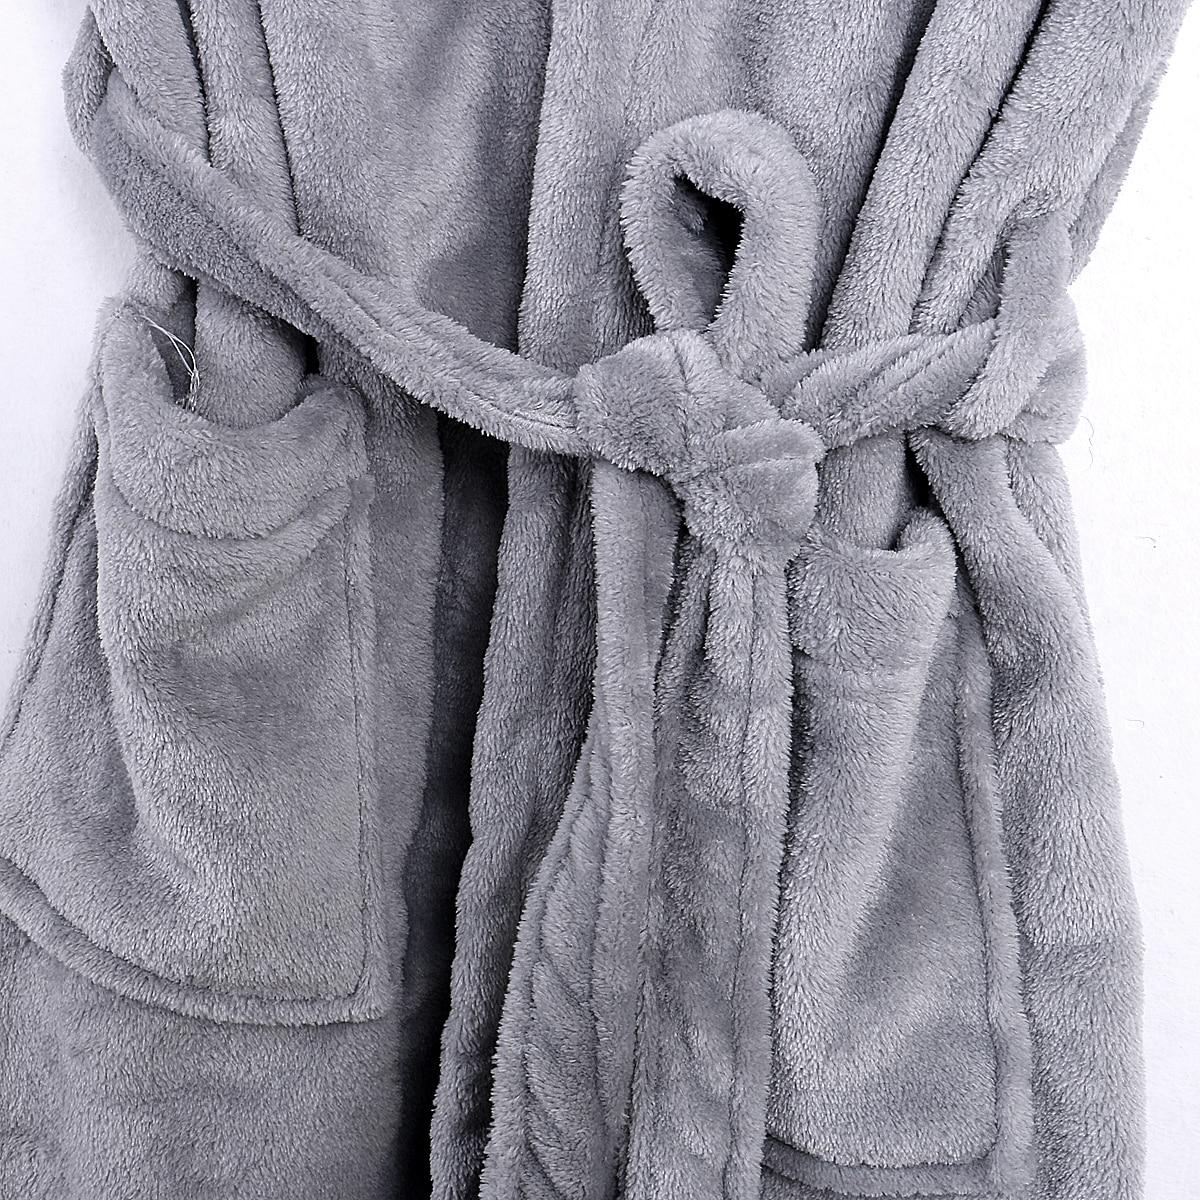 Men's Fall Long Sleepwear Flannel Robes Shawl Collar Fleece Bathrobe Spa Pajamas